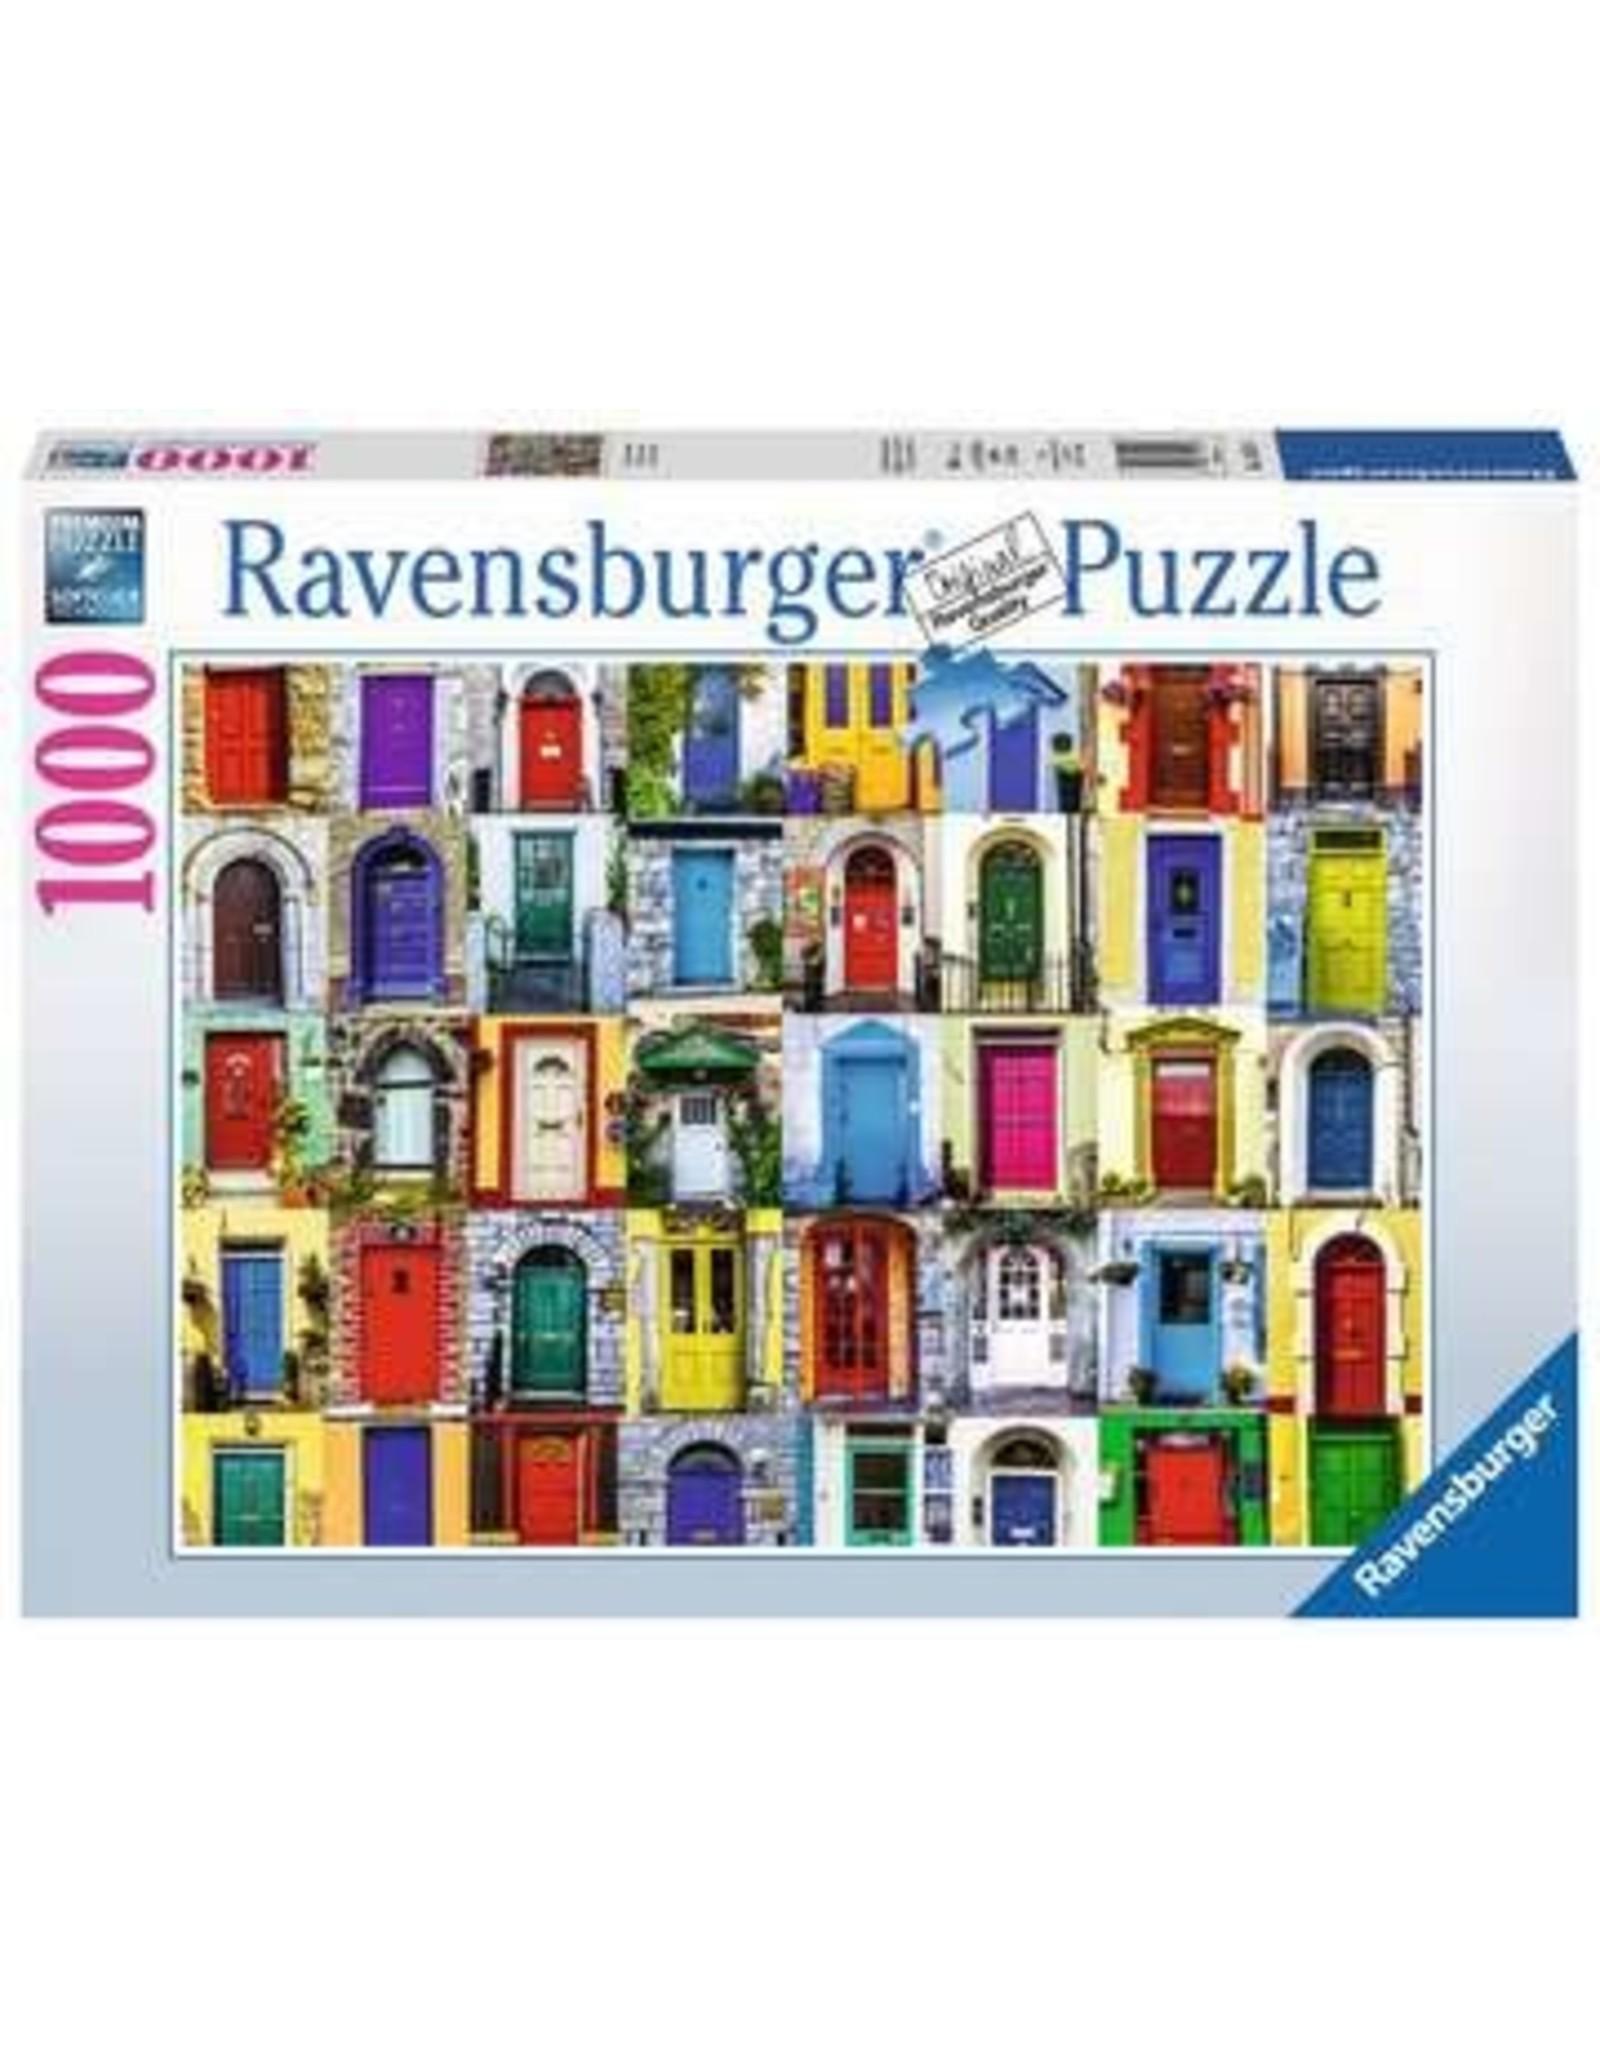 Ravensburger Doors of the World 1000p